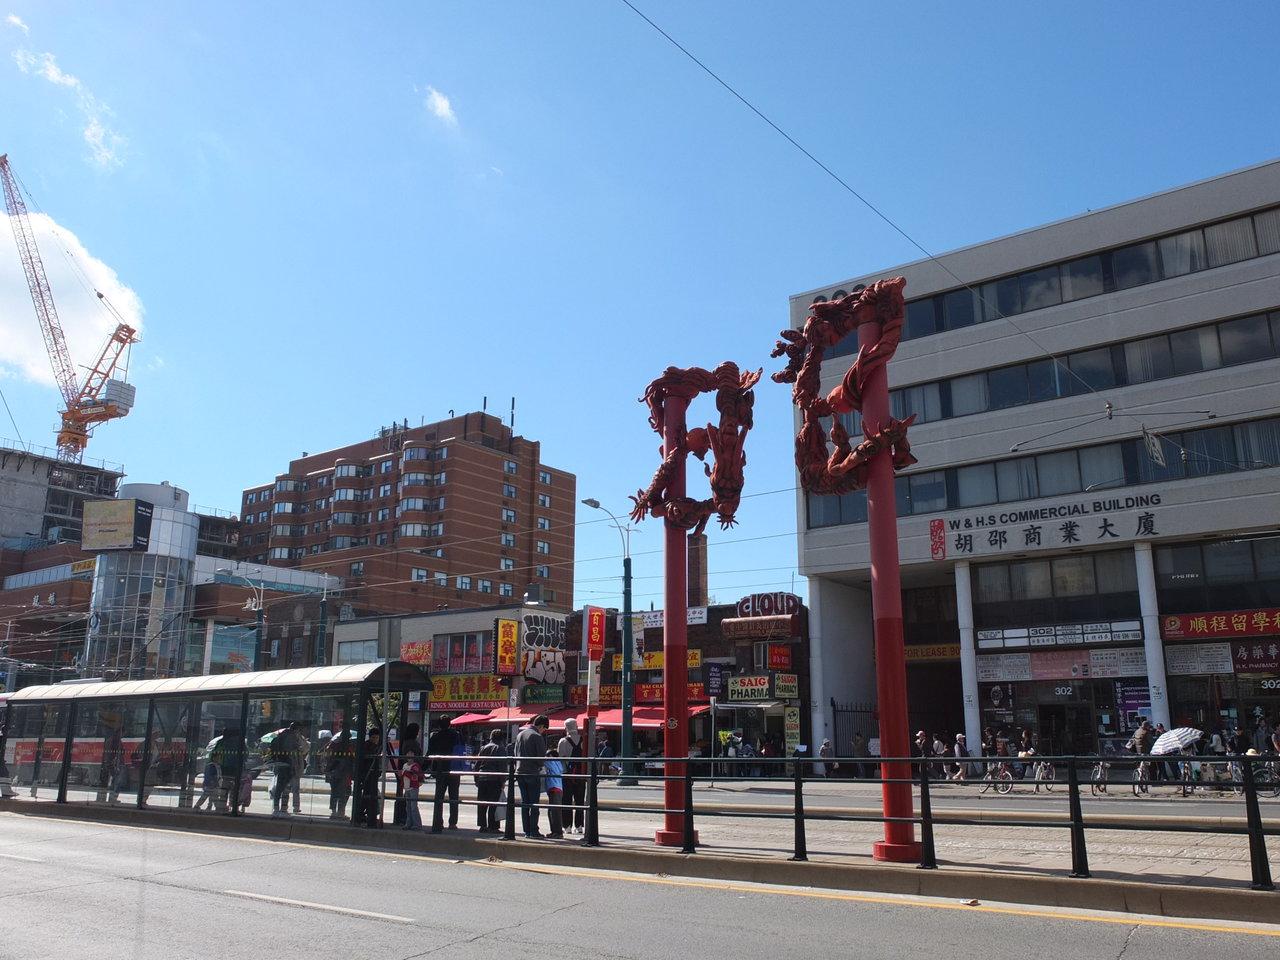 Spadina Avenue, looking West